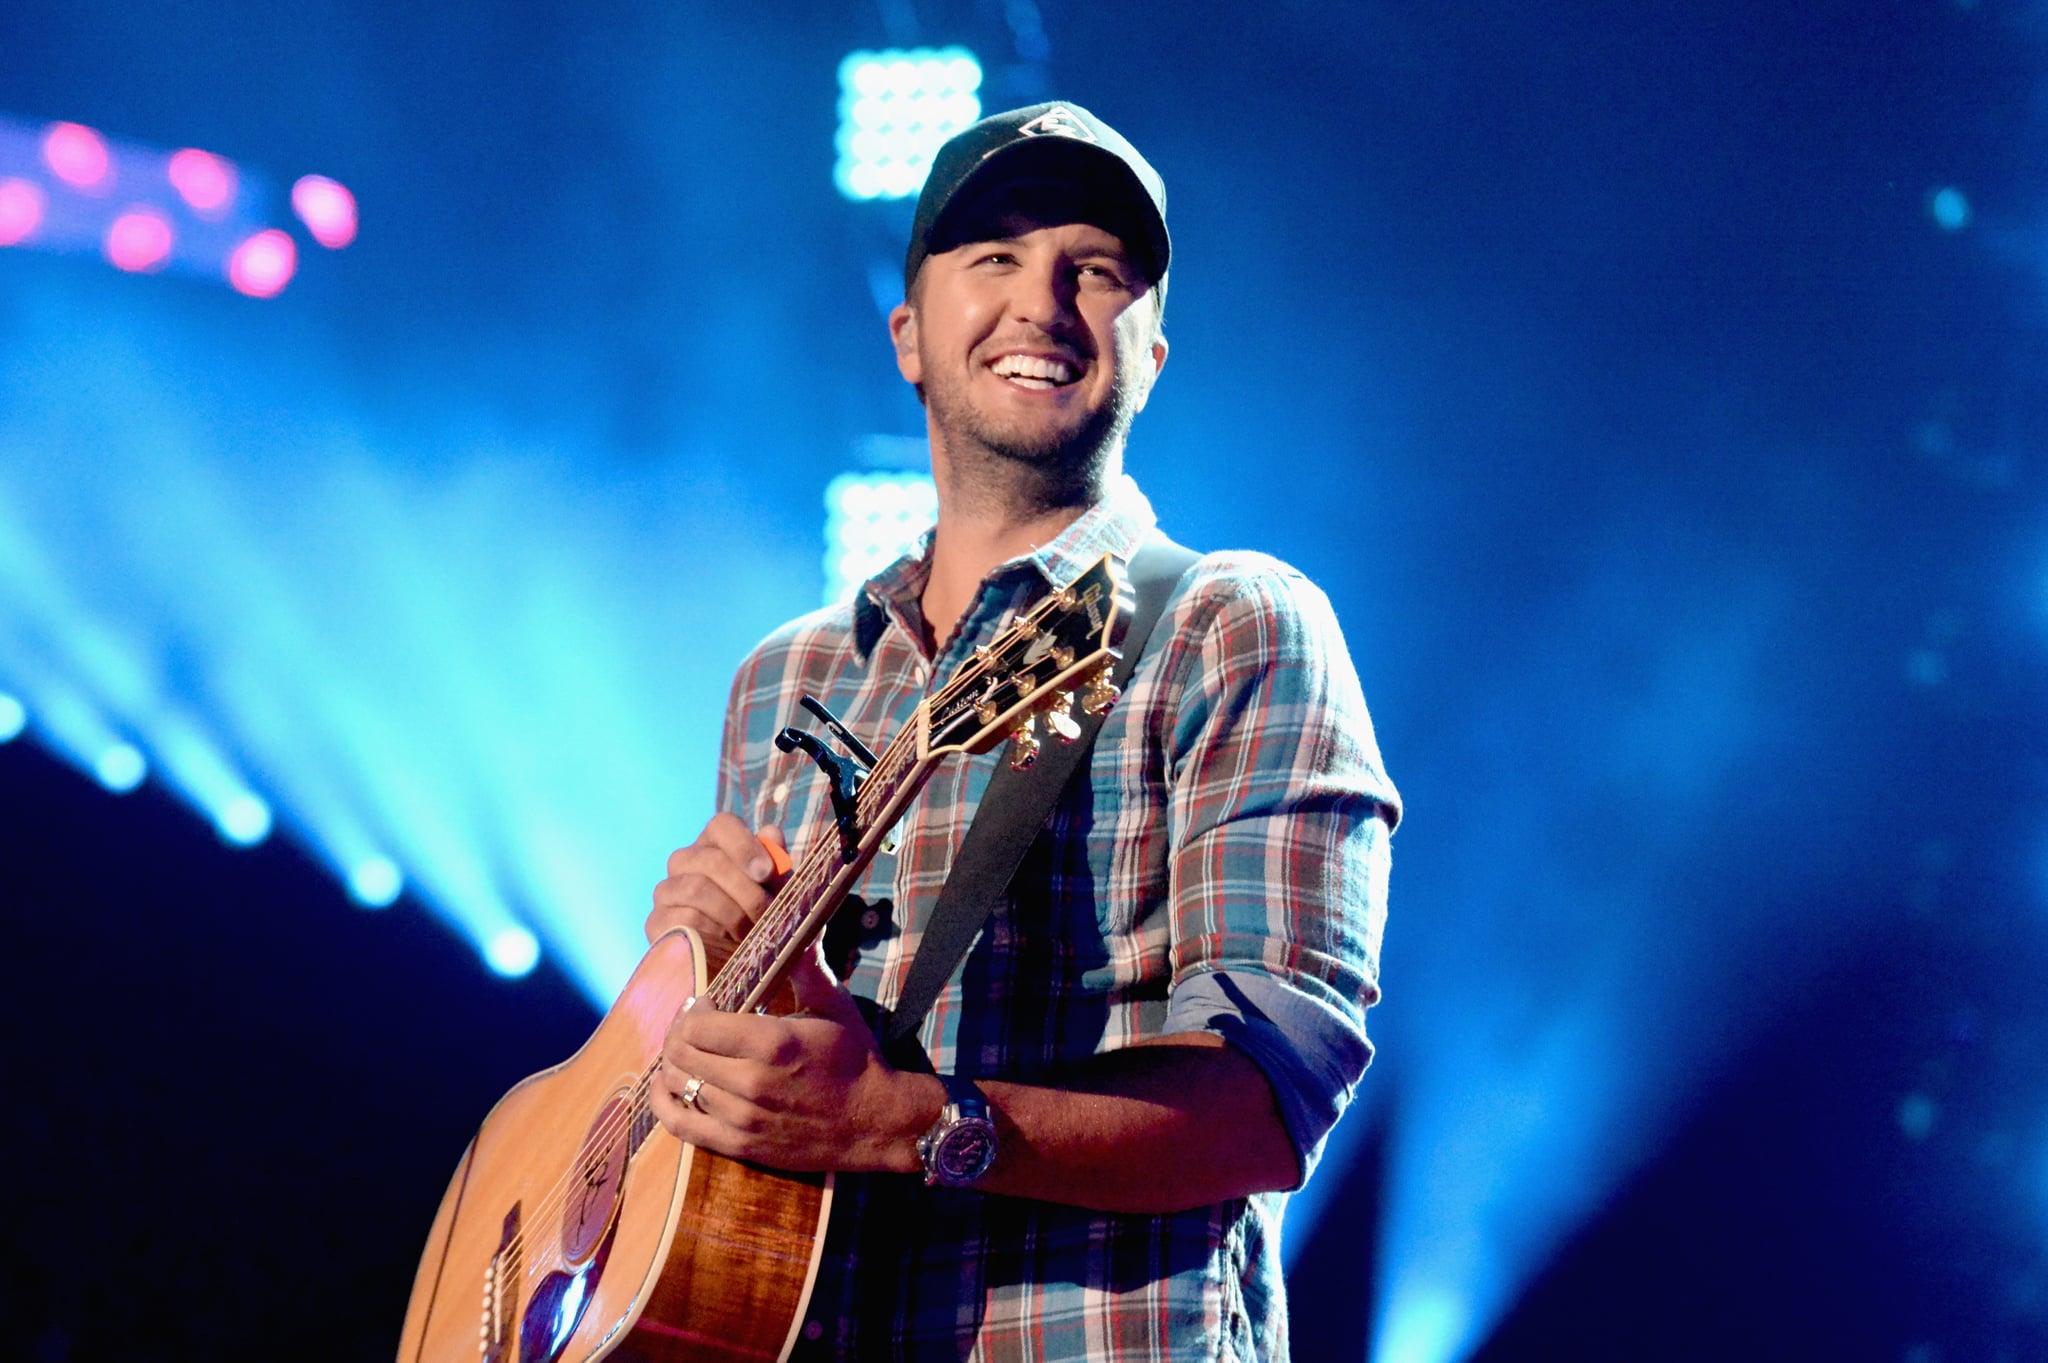 NASHVILLE, TN - JUNE 08:  Luke Bryan performs onstage during the 2016 CMT Music awards at the Bridgestone Arena on June 8, 2016 in Nashville, Tennessee.  (Photo by Jeff Kravitz/FilmMagic)